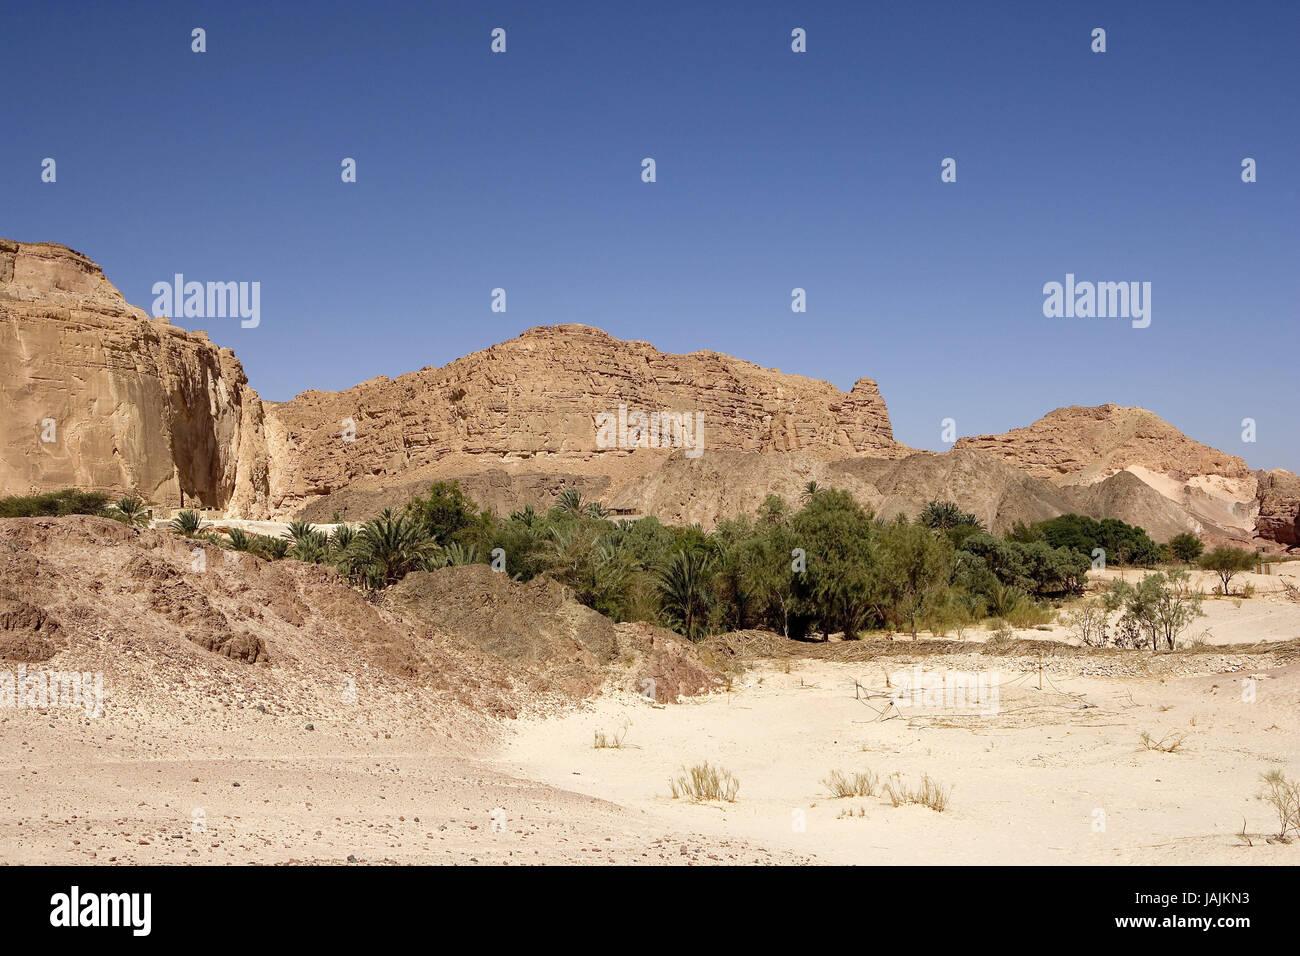 Egypt,Sinai,desert Sinai,area of Nuweiba,oasis Ain Khudra, - Stock Image